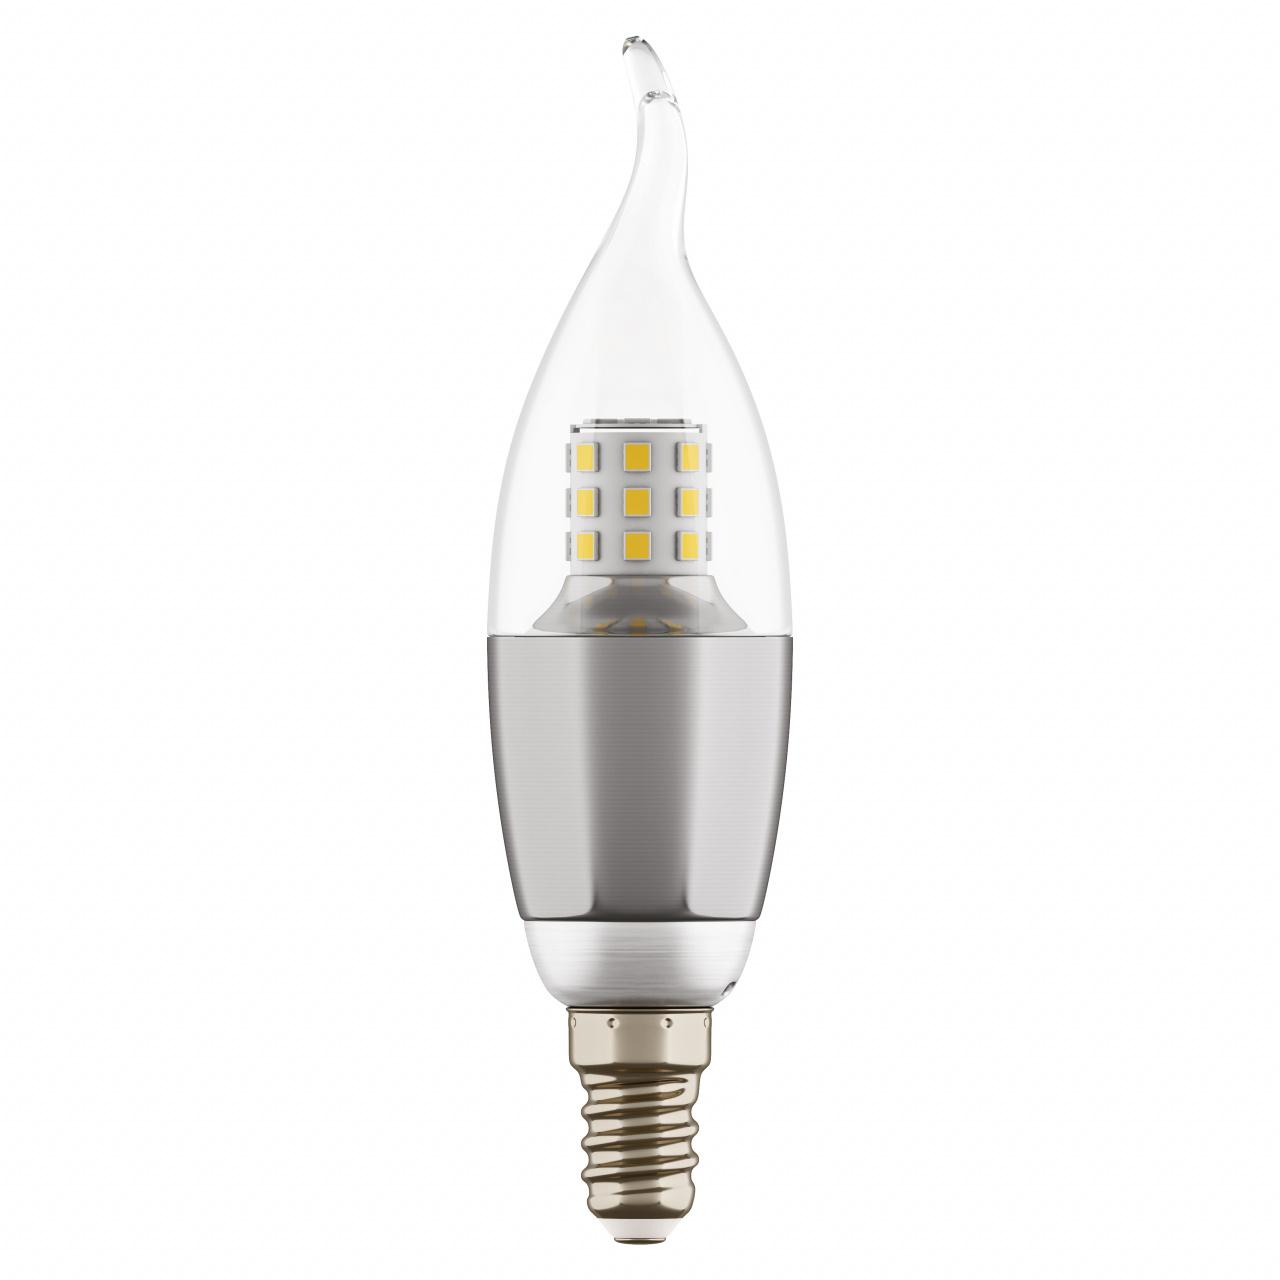 Лампа LED 220V CA35 E14 7W=70W 460LM 60G CL/CH 3000K 20000H Lightstar 940642